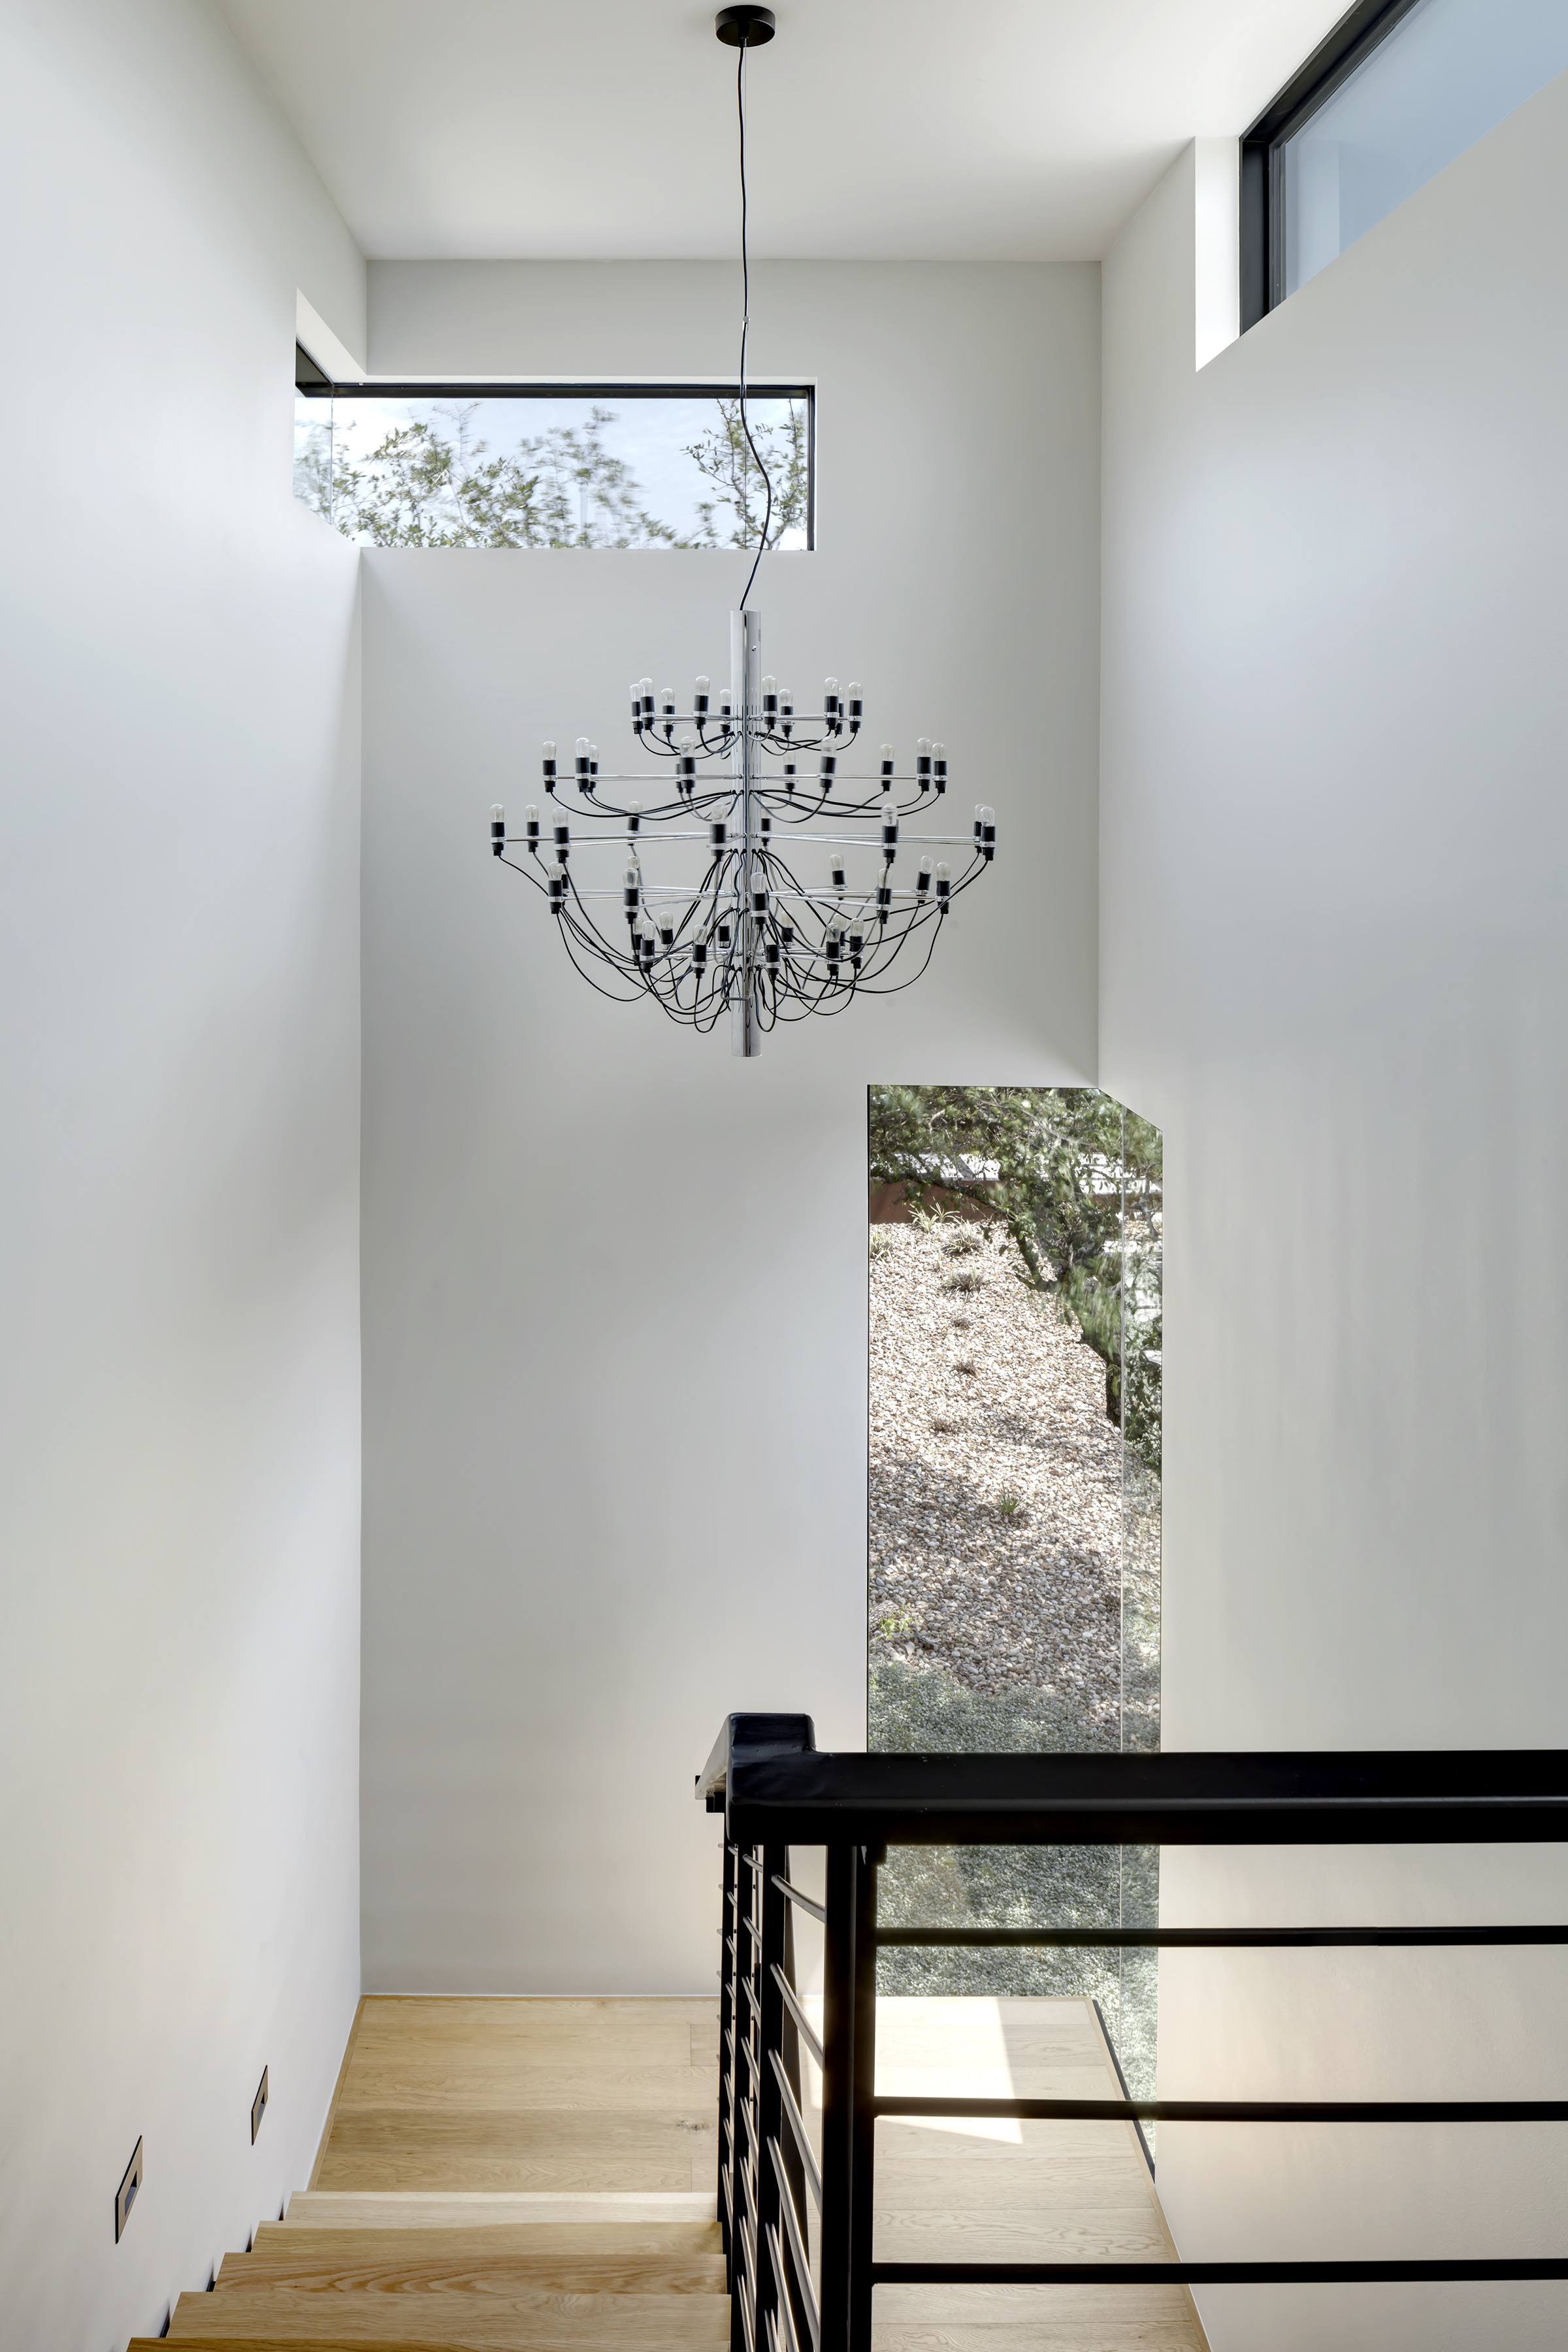 Matt Fajkus MF Architecture_Control-Shift House_Interior Photo 14 by Charles Davis Smith.jpg